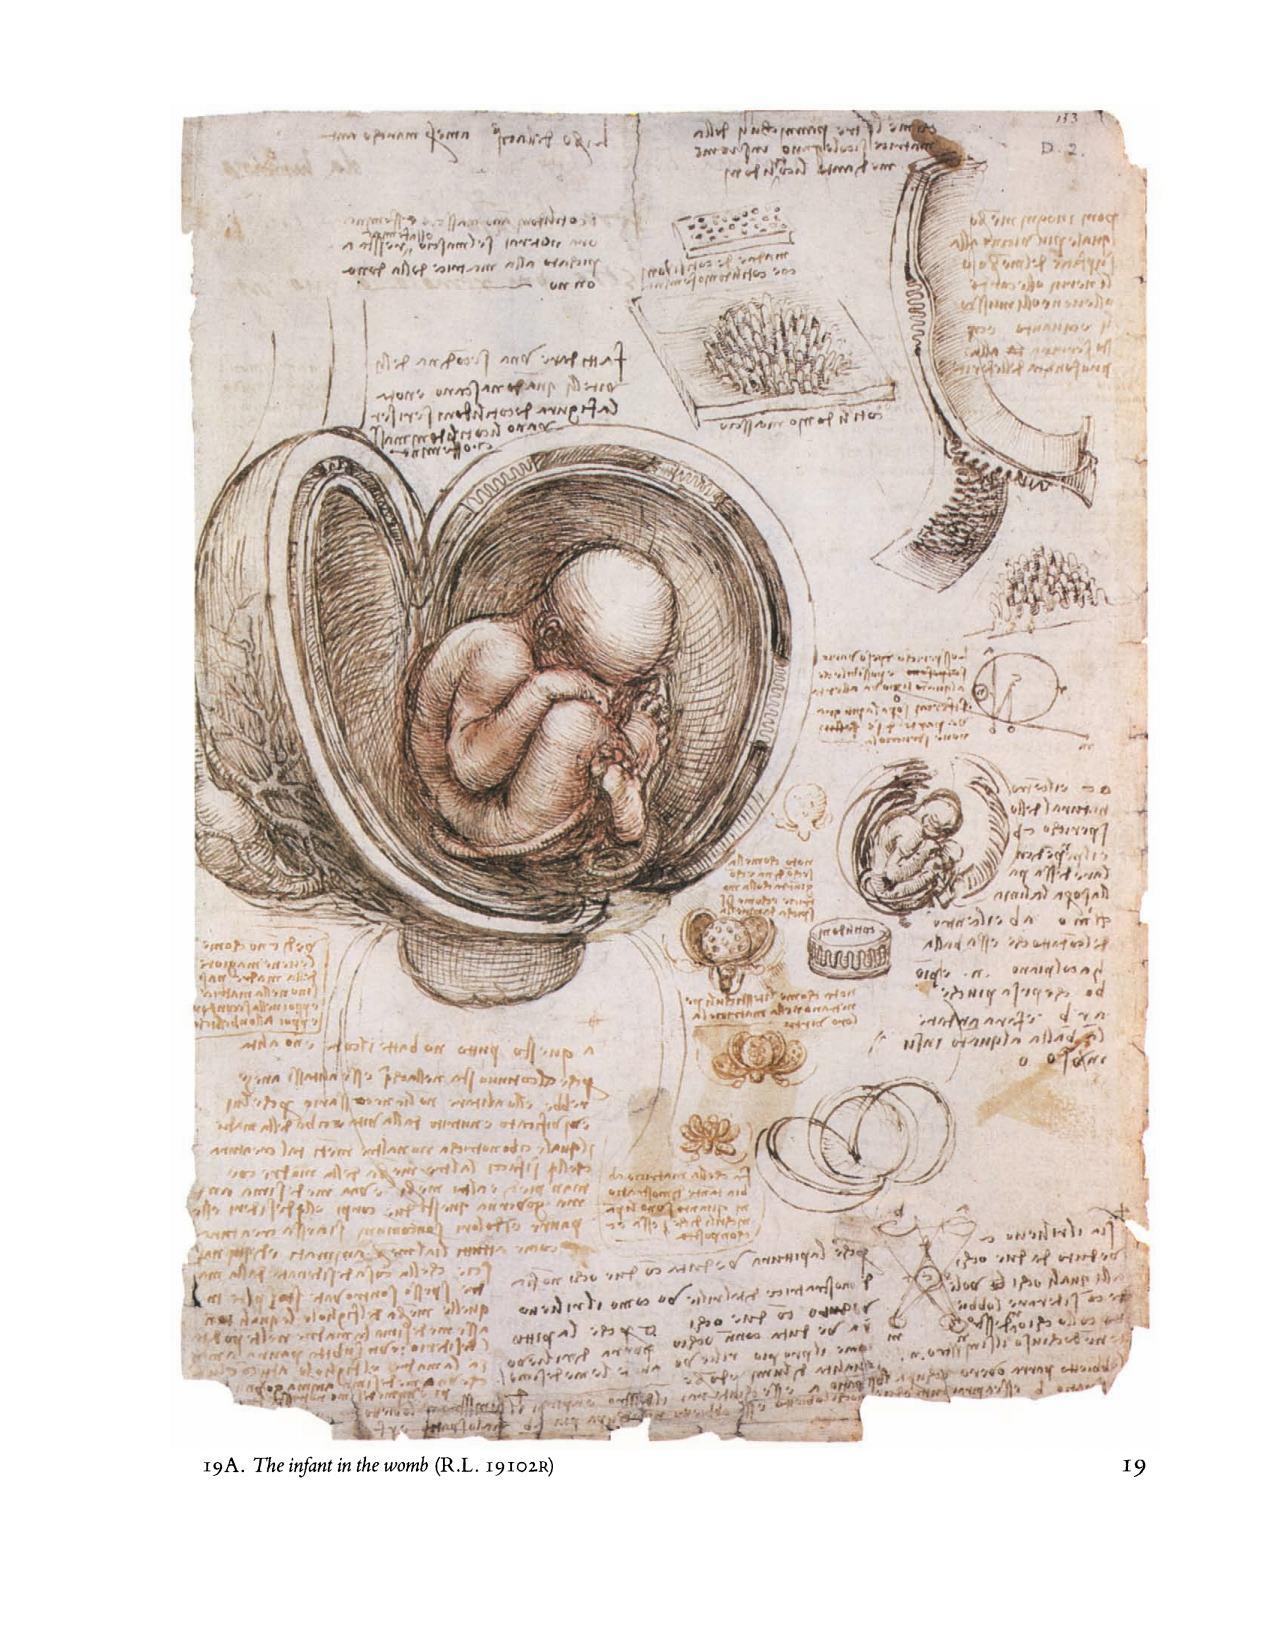 Leonardo da Vinci: Anatomical Drawings from the Royal